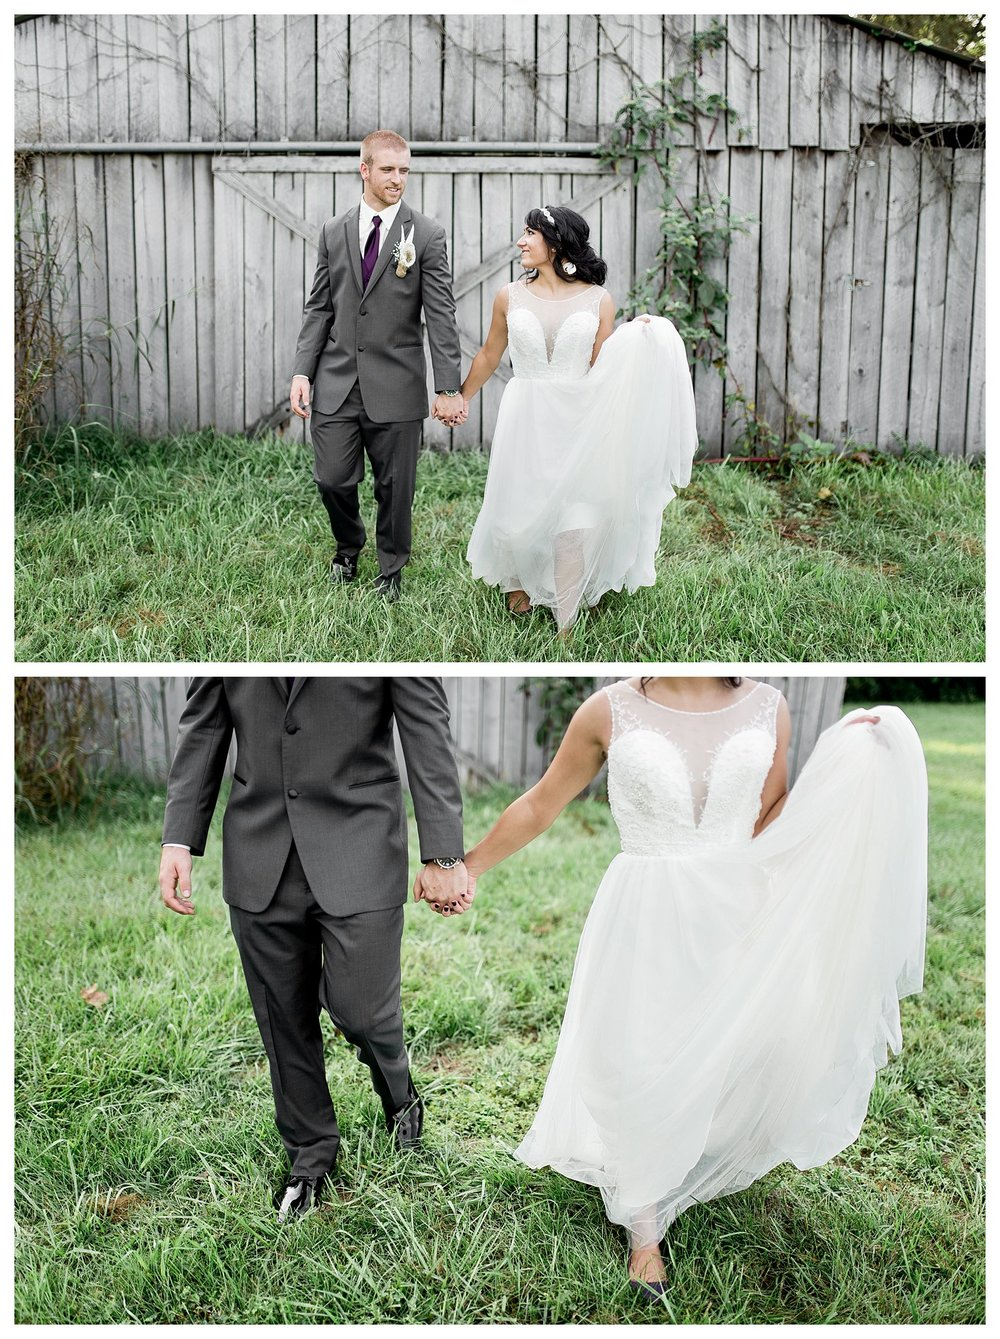 everleigh-photography-cincinnati-wedding-photographer-lake-lyndsay-wedding-hamilton-ohio_27